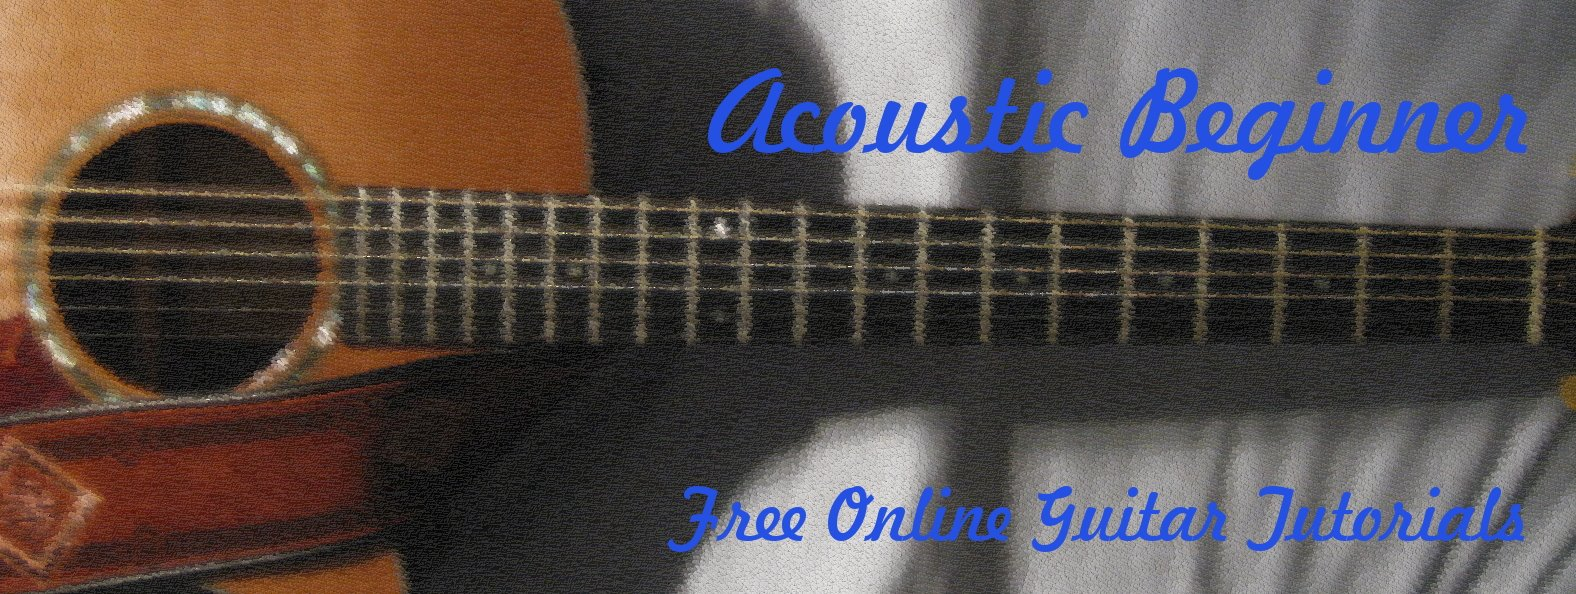 Acoustic Beginner